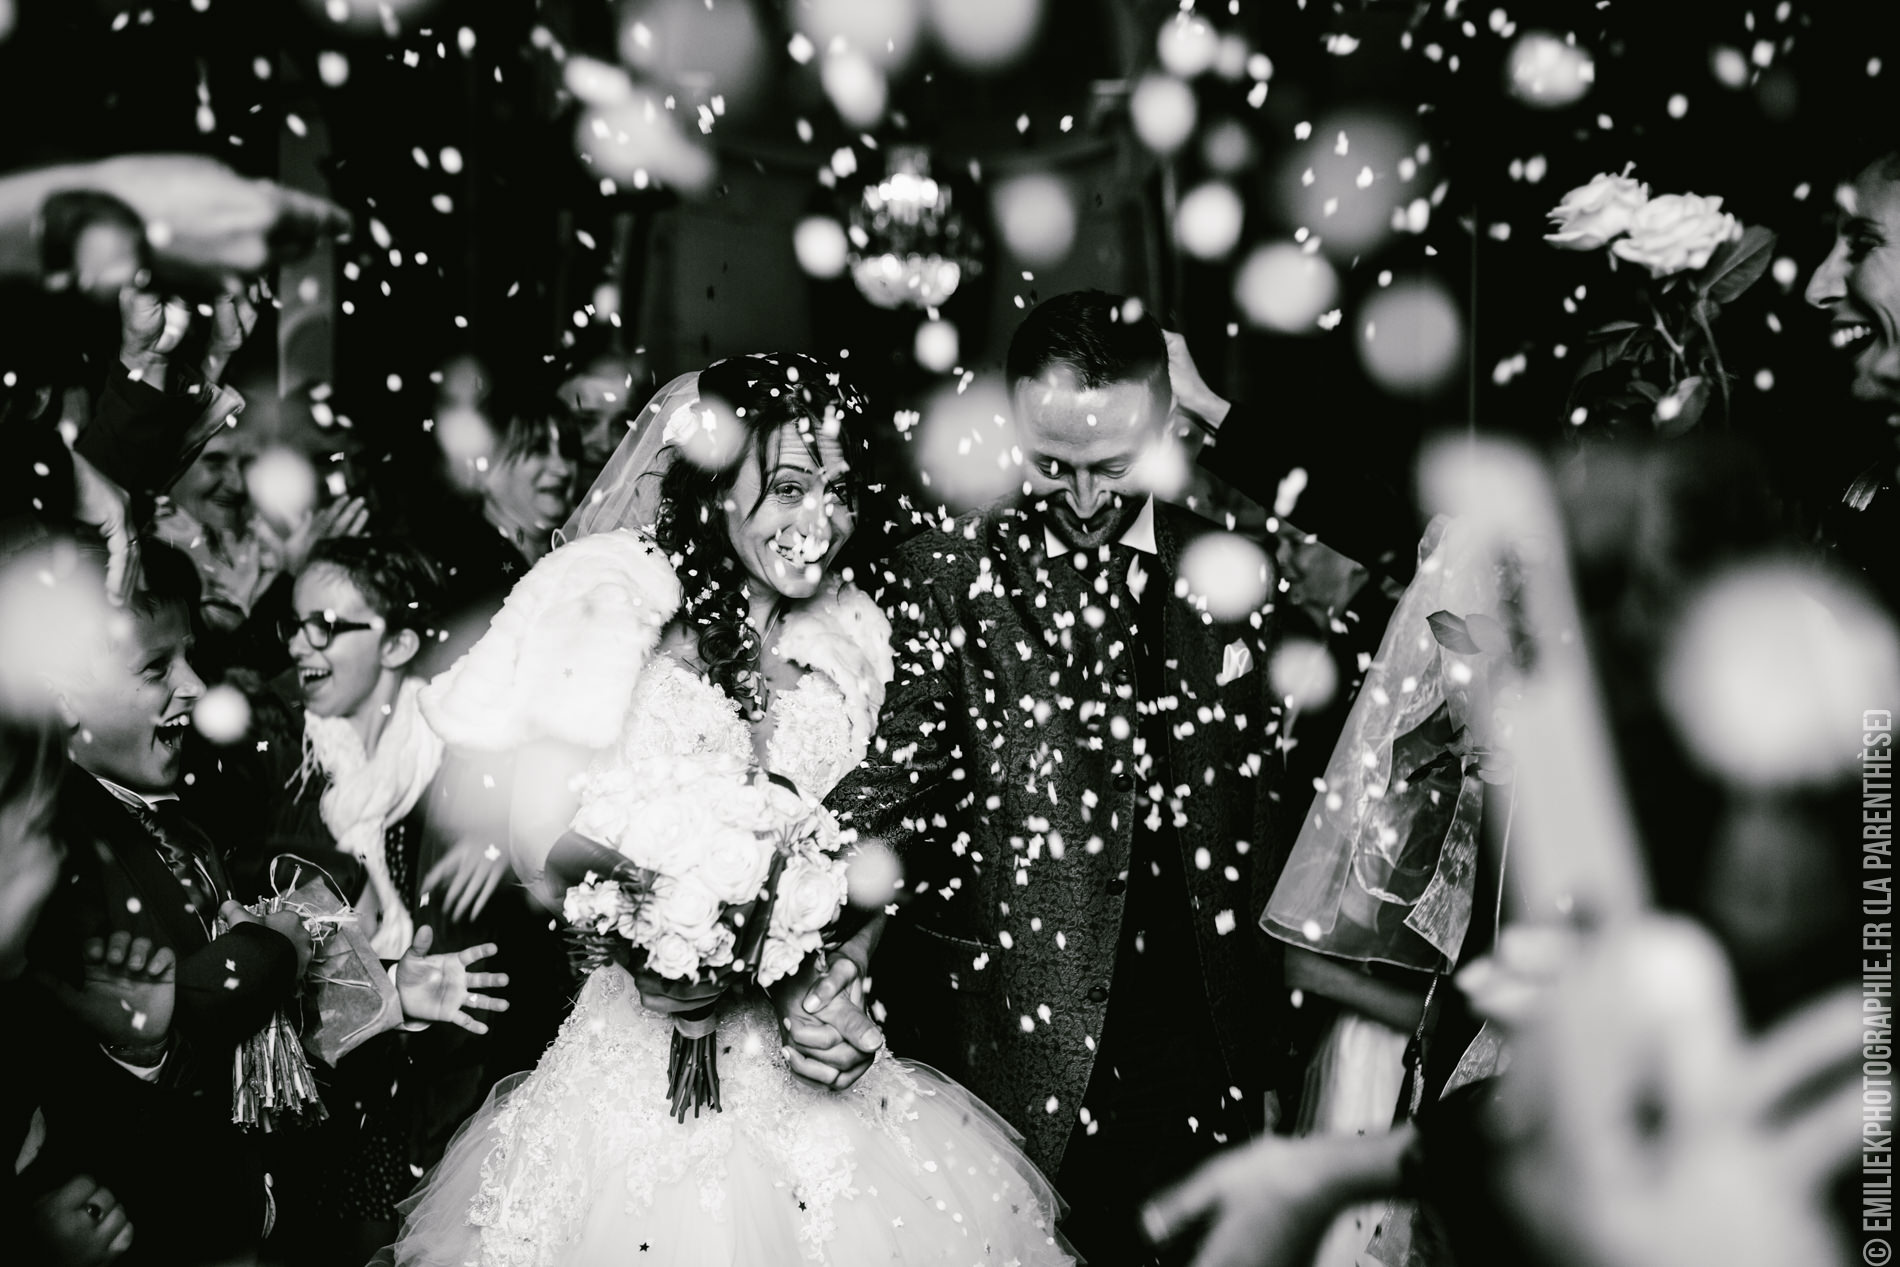 mariage-sortie-eglise-emiliekphotographie182-2